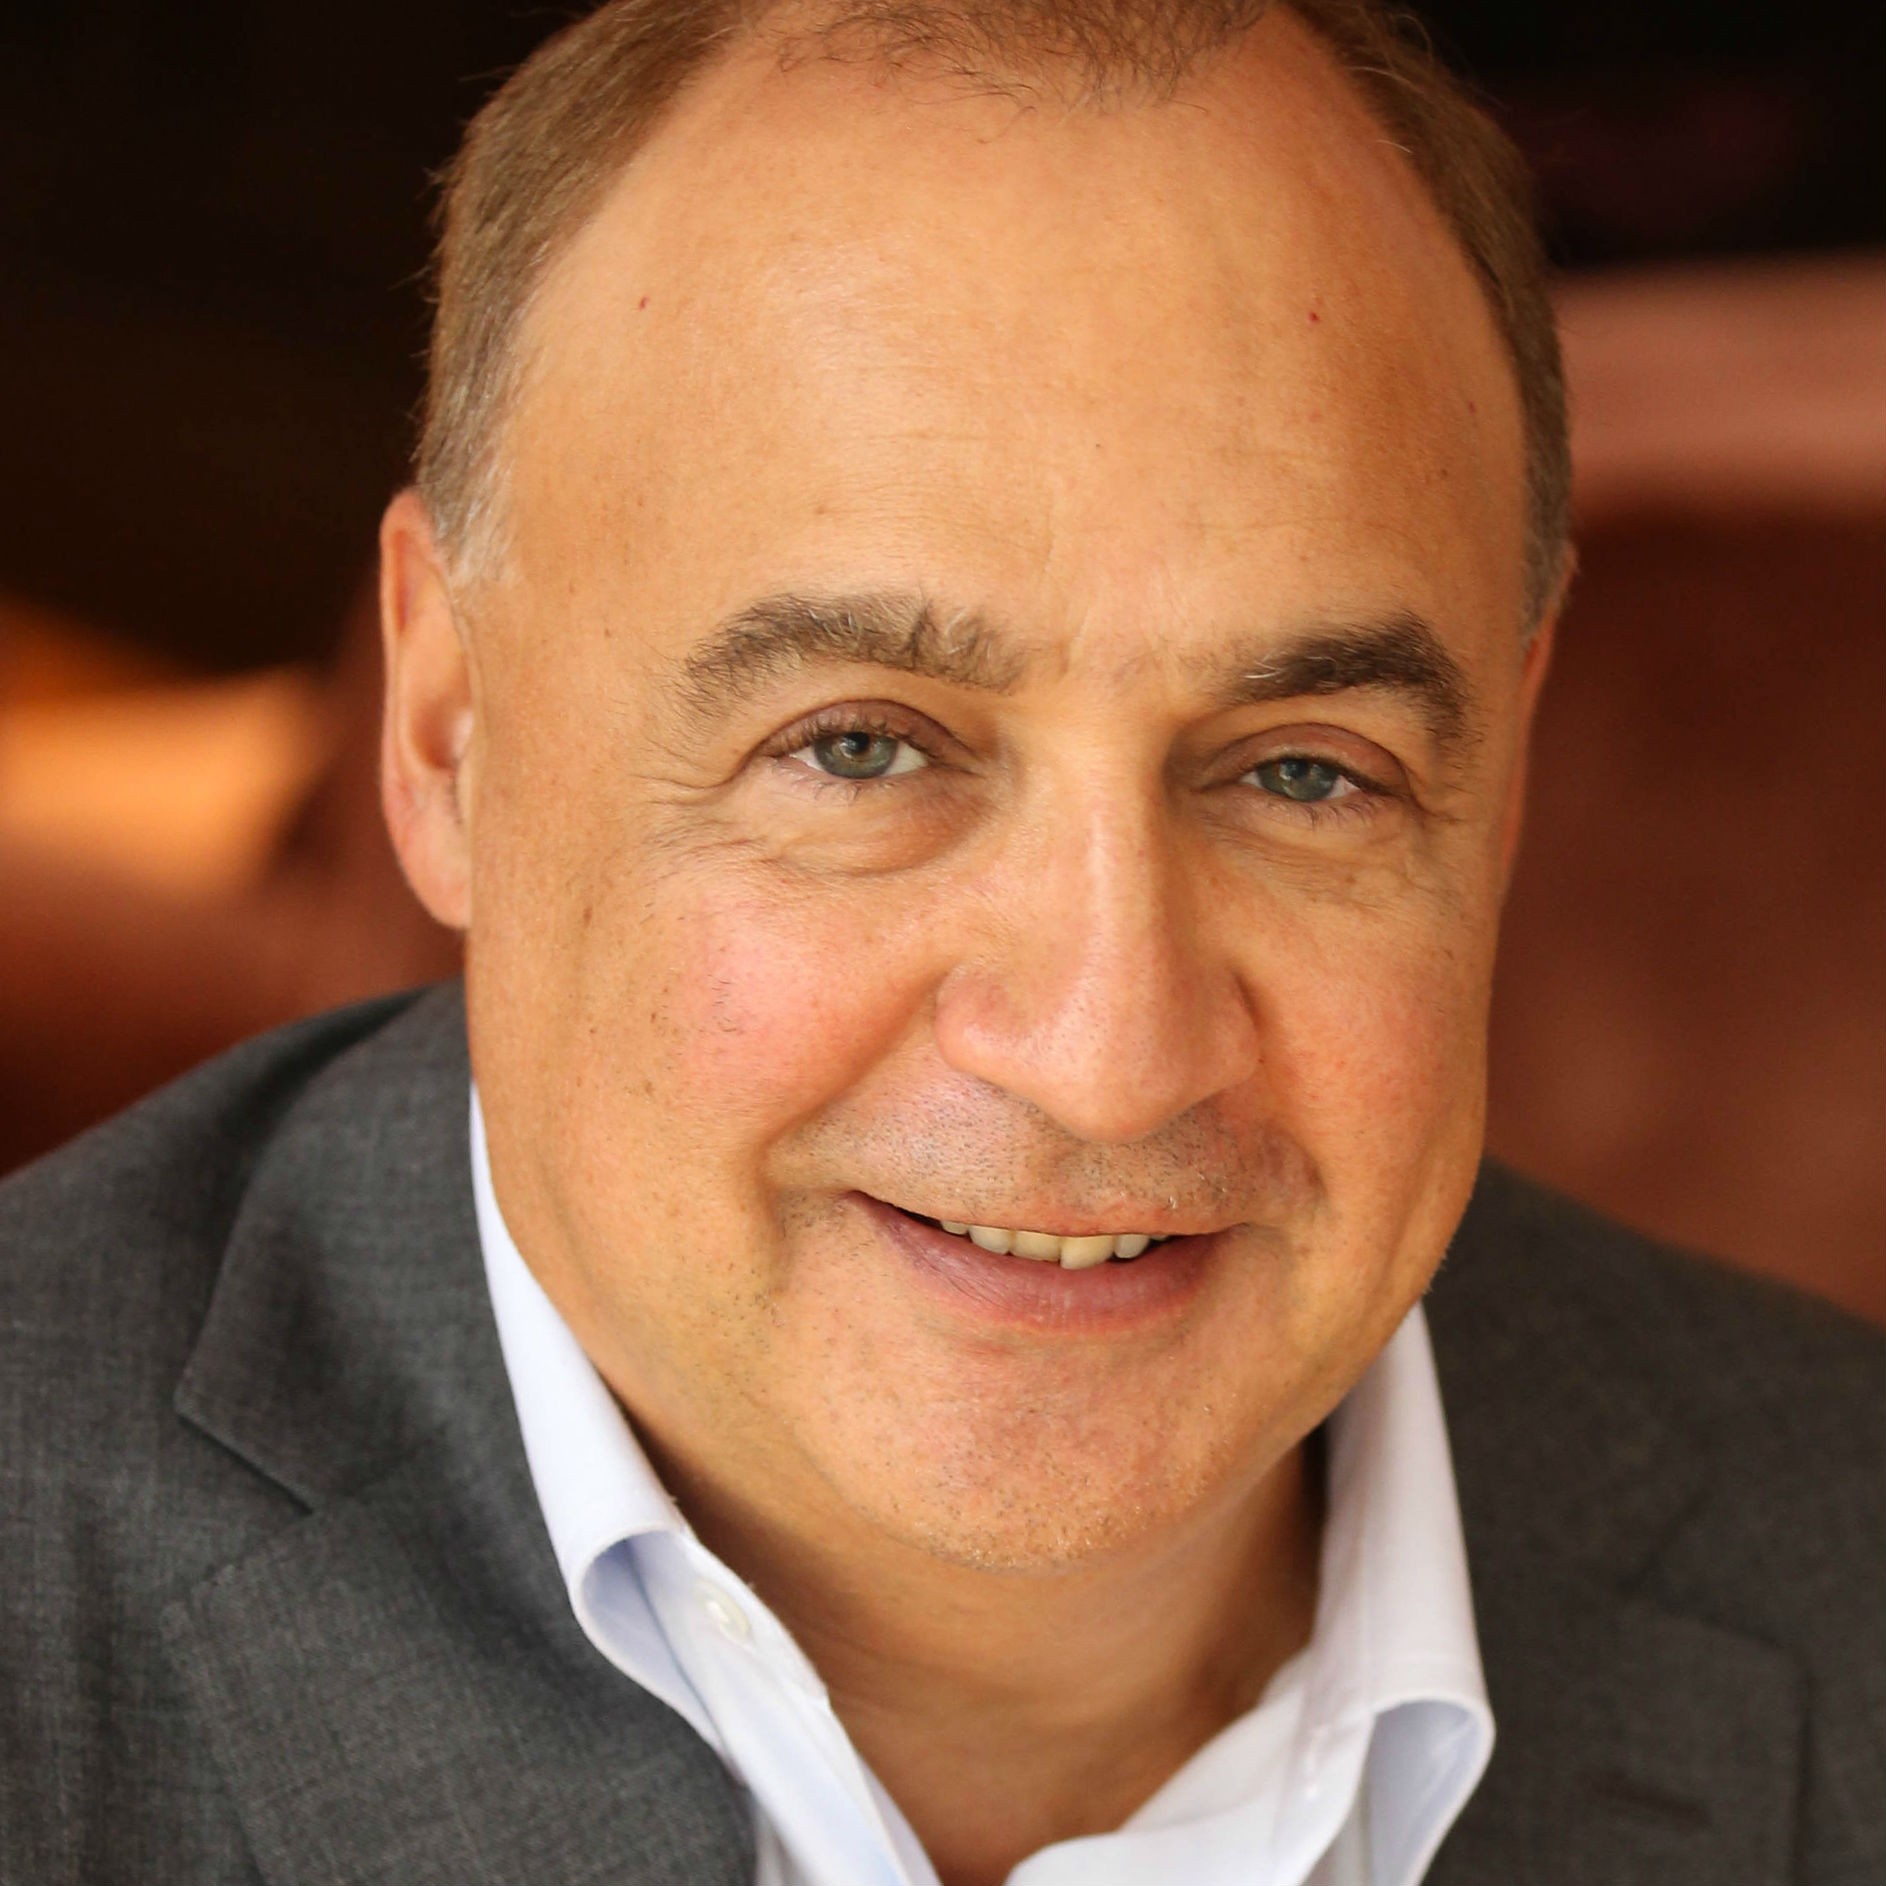 The Blavatnik Family Foundation Announces $20 Million Gift to TAU